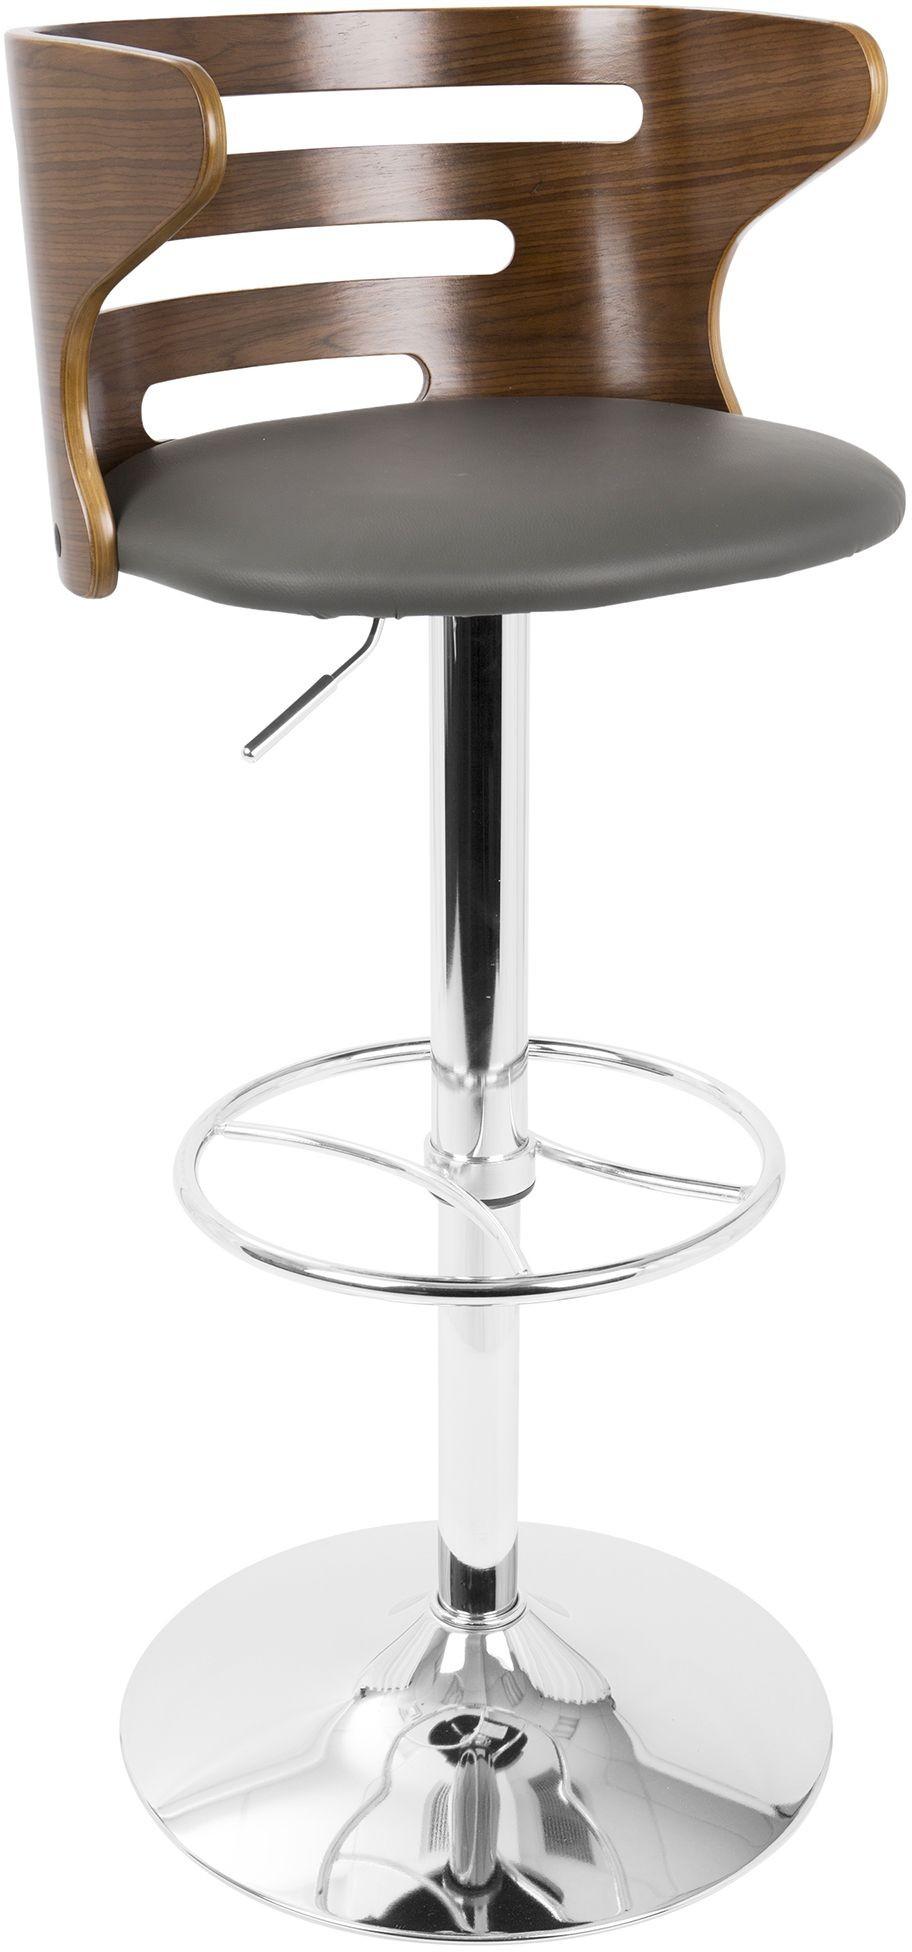 Cosi Walnut And Gray Adjustable Swivel Barstool Set Of 2